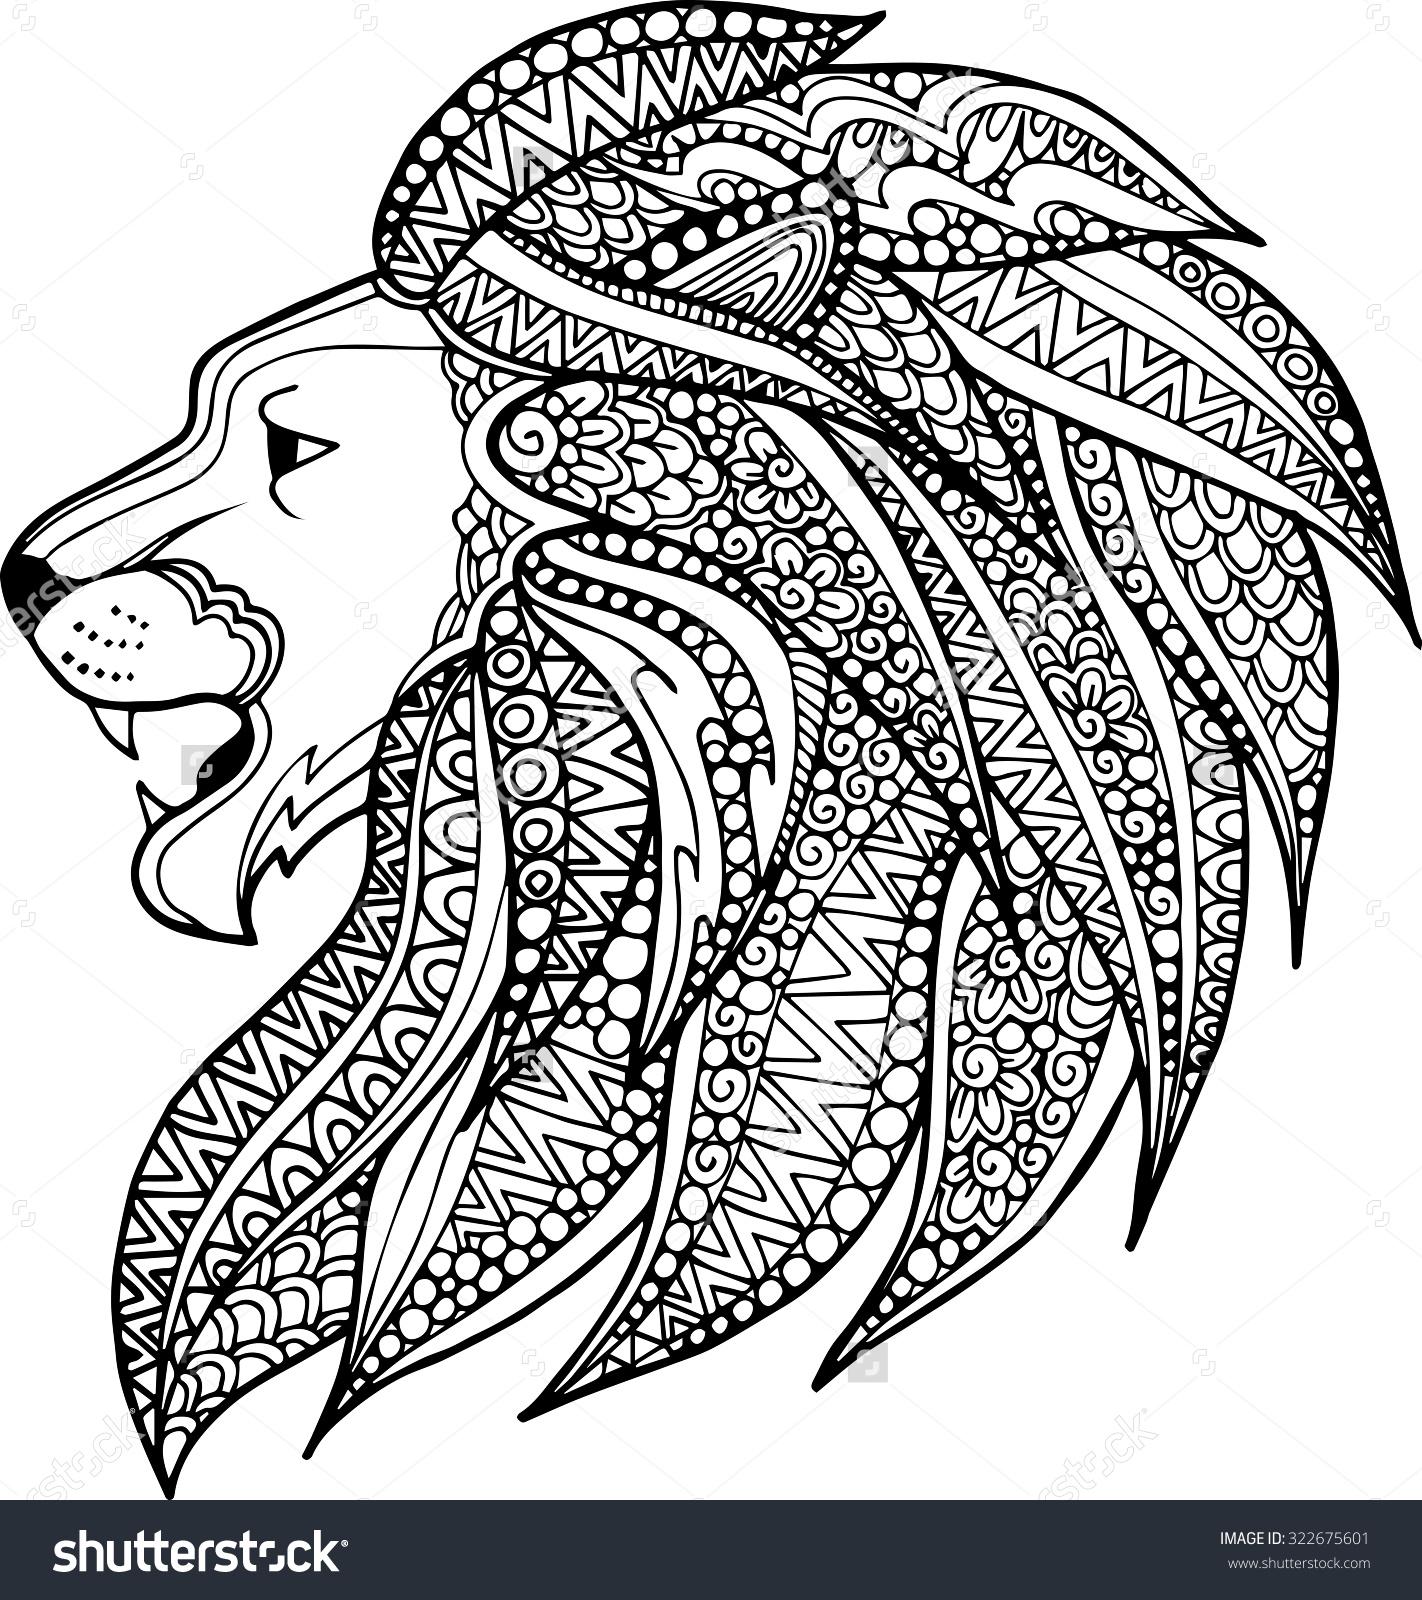 Drawn ornamental lion Zentangle Hand Drawn : Hand